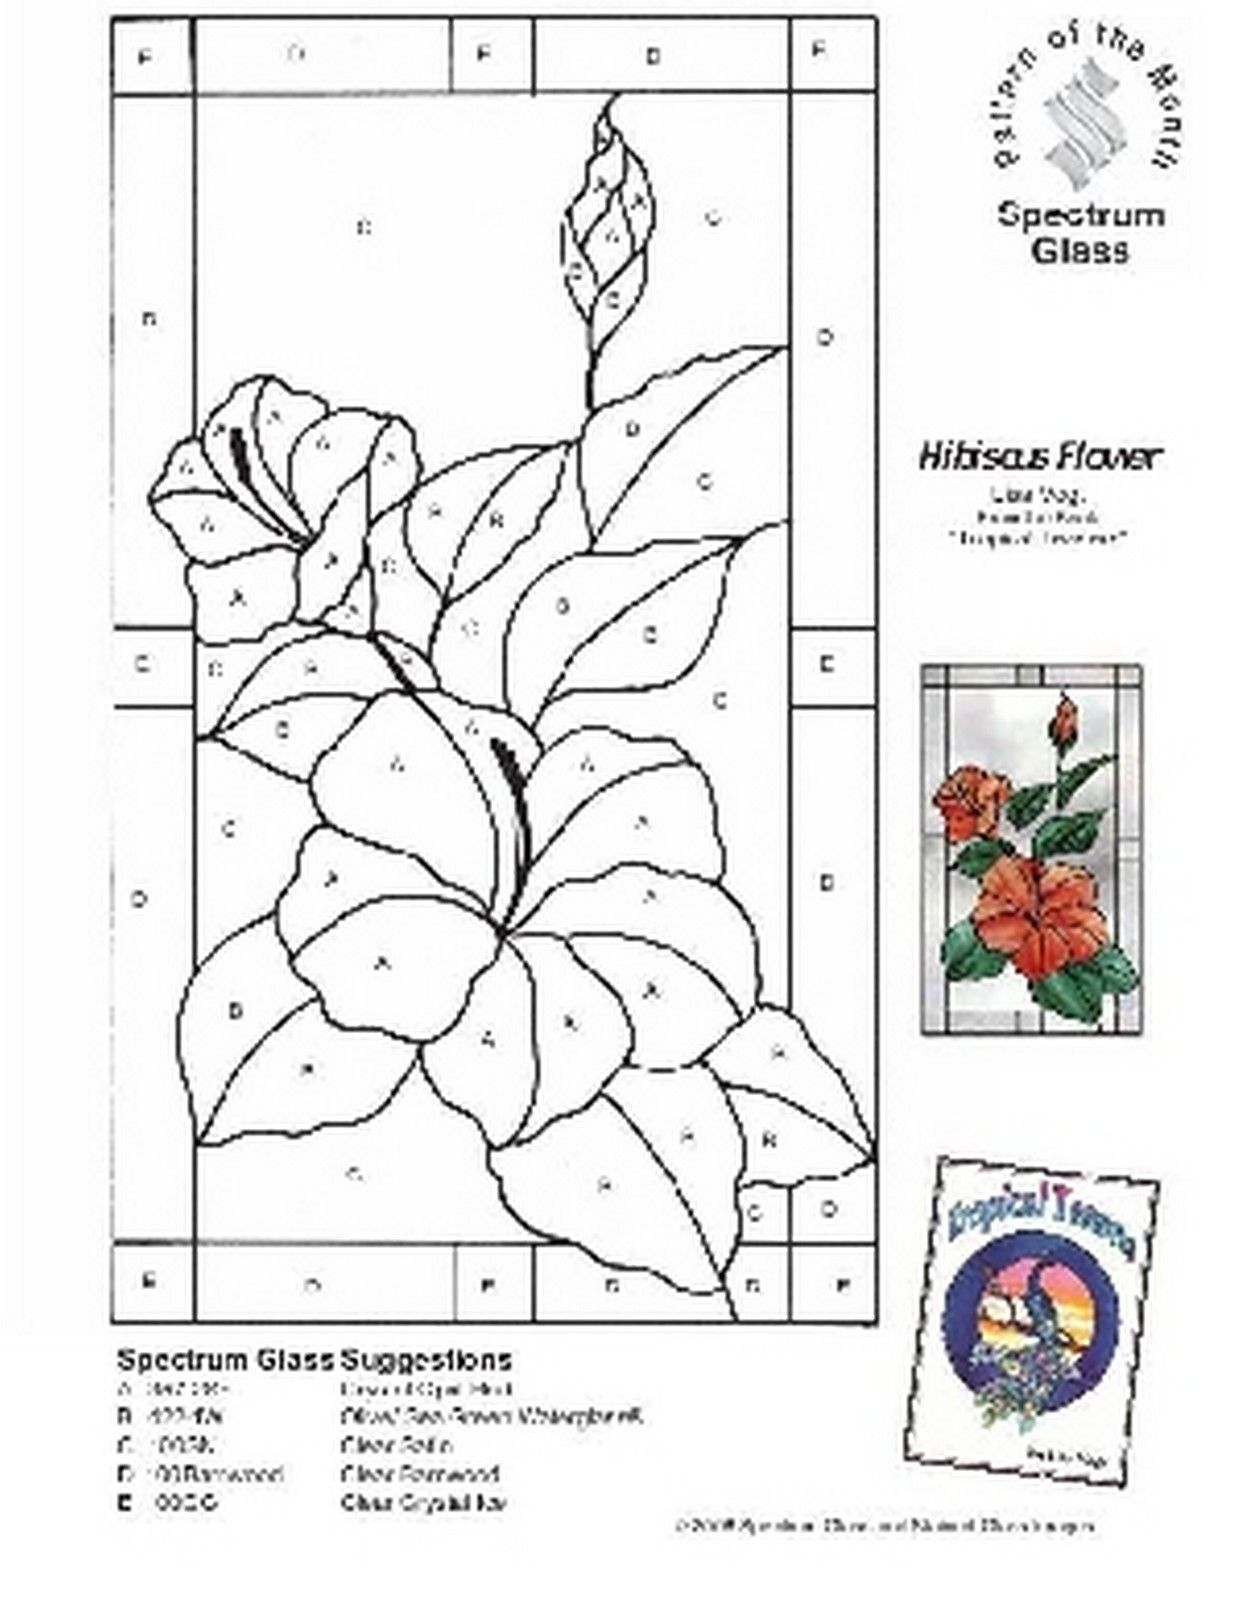 Free stained glass pattern 2293 hibiscus flower stained glass free stained glass pattern 2293 hibiscus flower izmirmasajfo